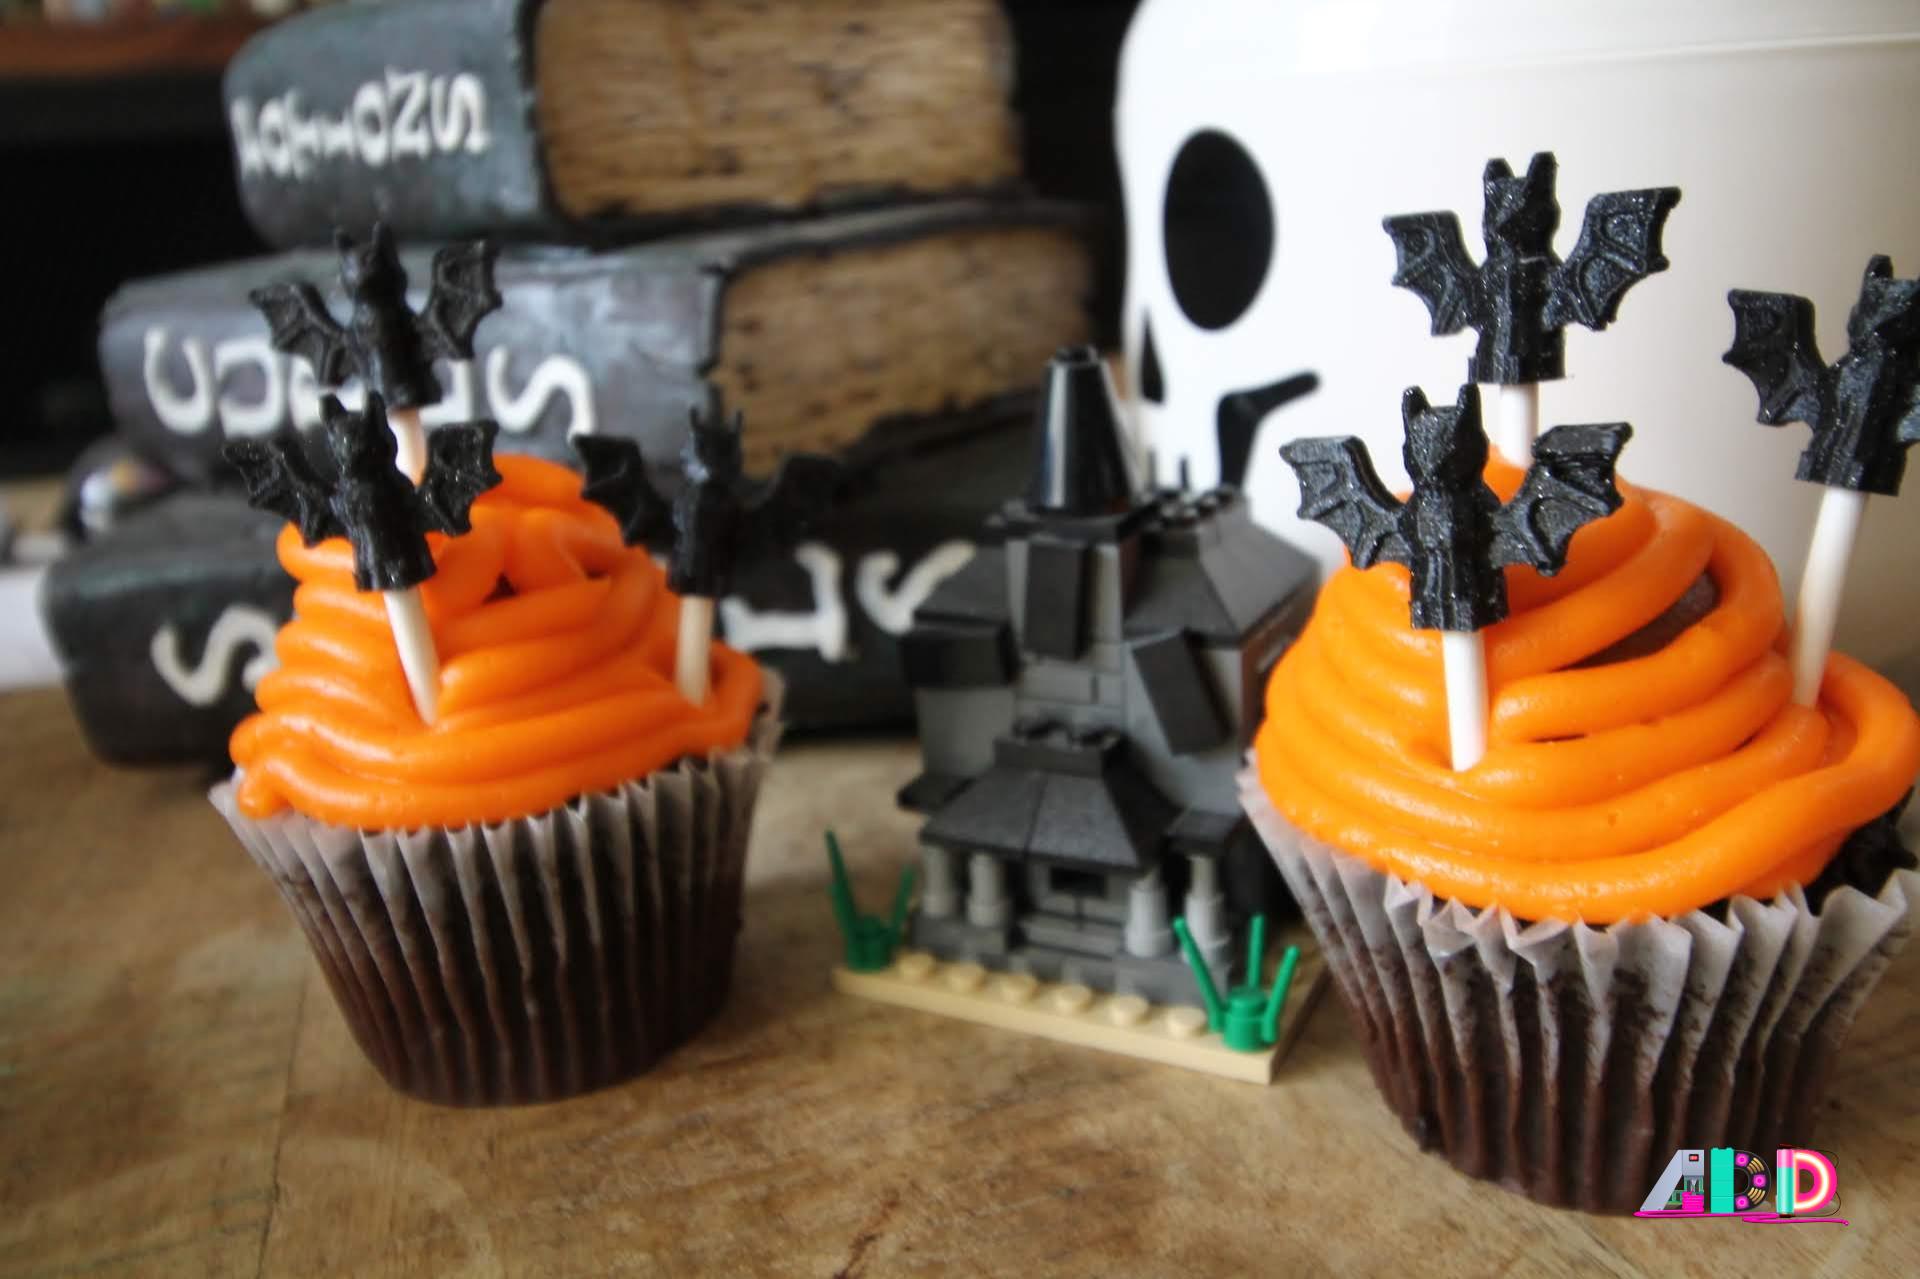 3D Printed Proto-Pasta LEGO bats | AmieDD